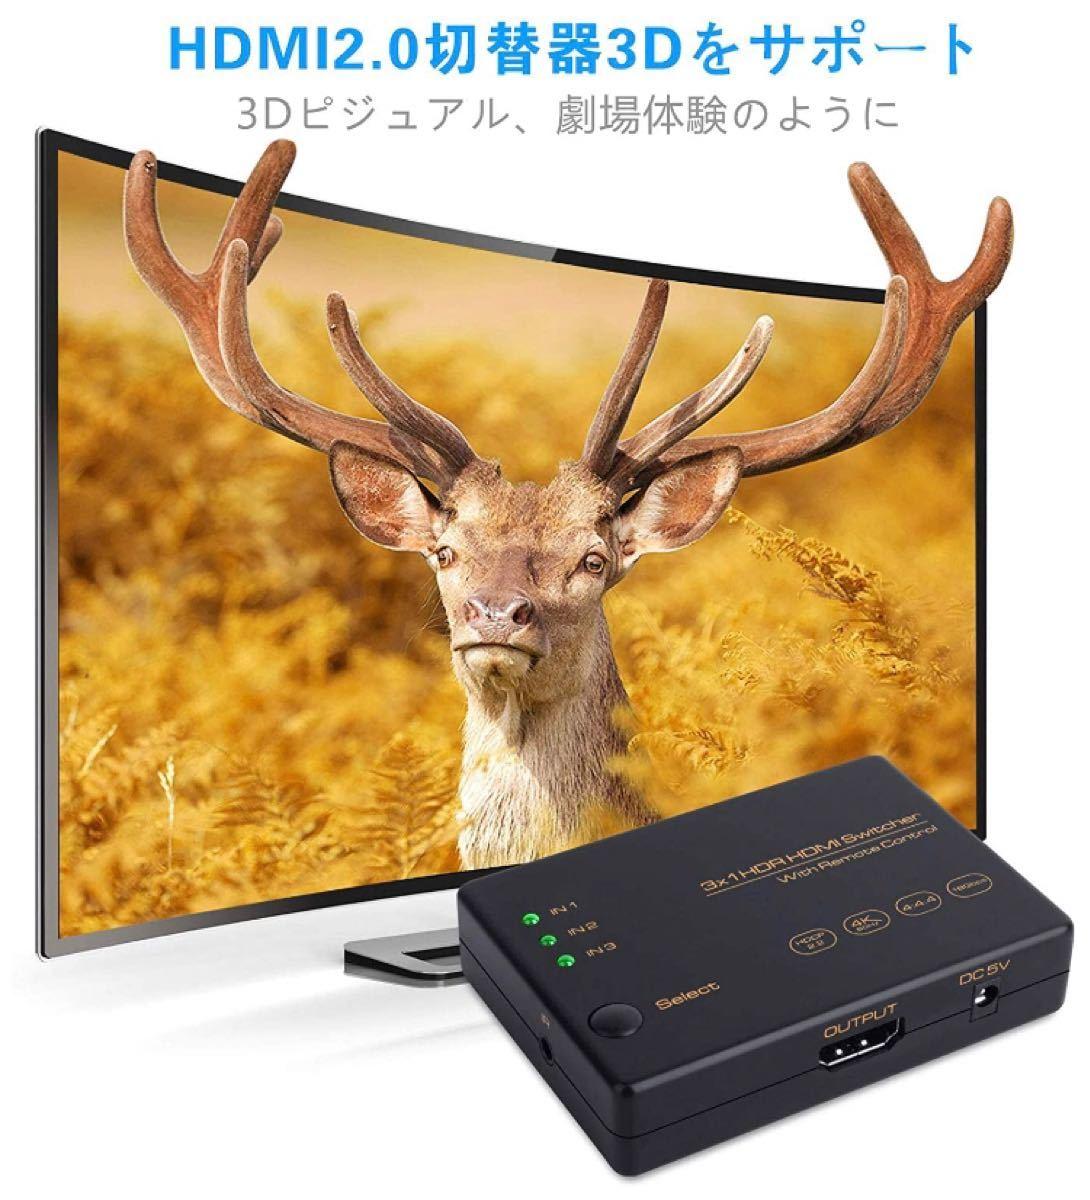 3入力1出力 HDMI2.0 4K60Hz HDMI分配器 usb給電 4K+3D  HDMIセレクター HDMI切替器